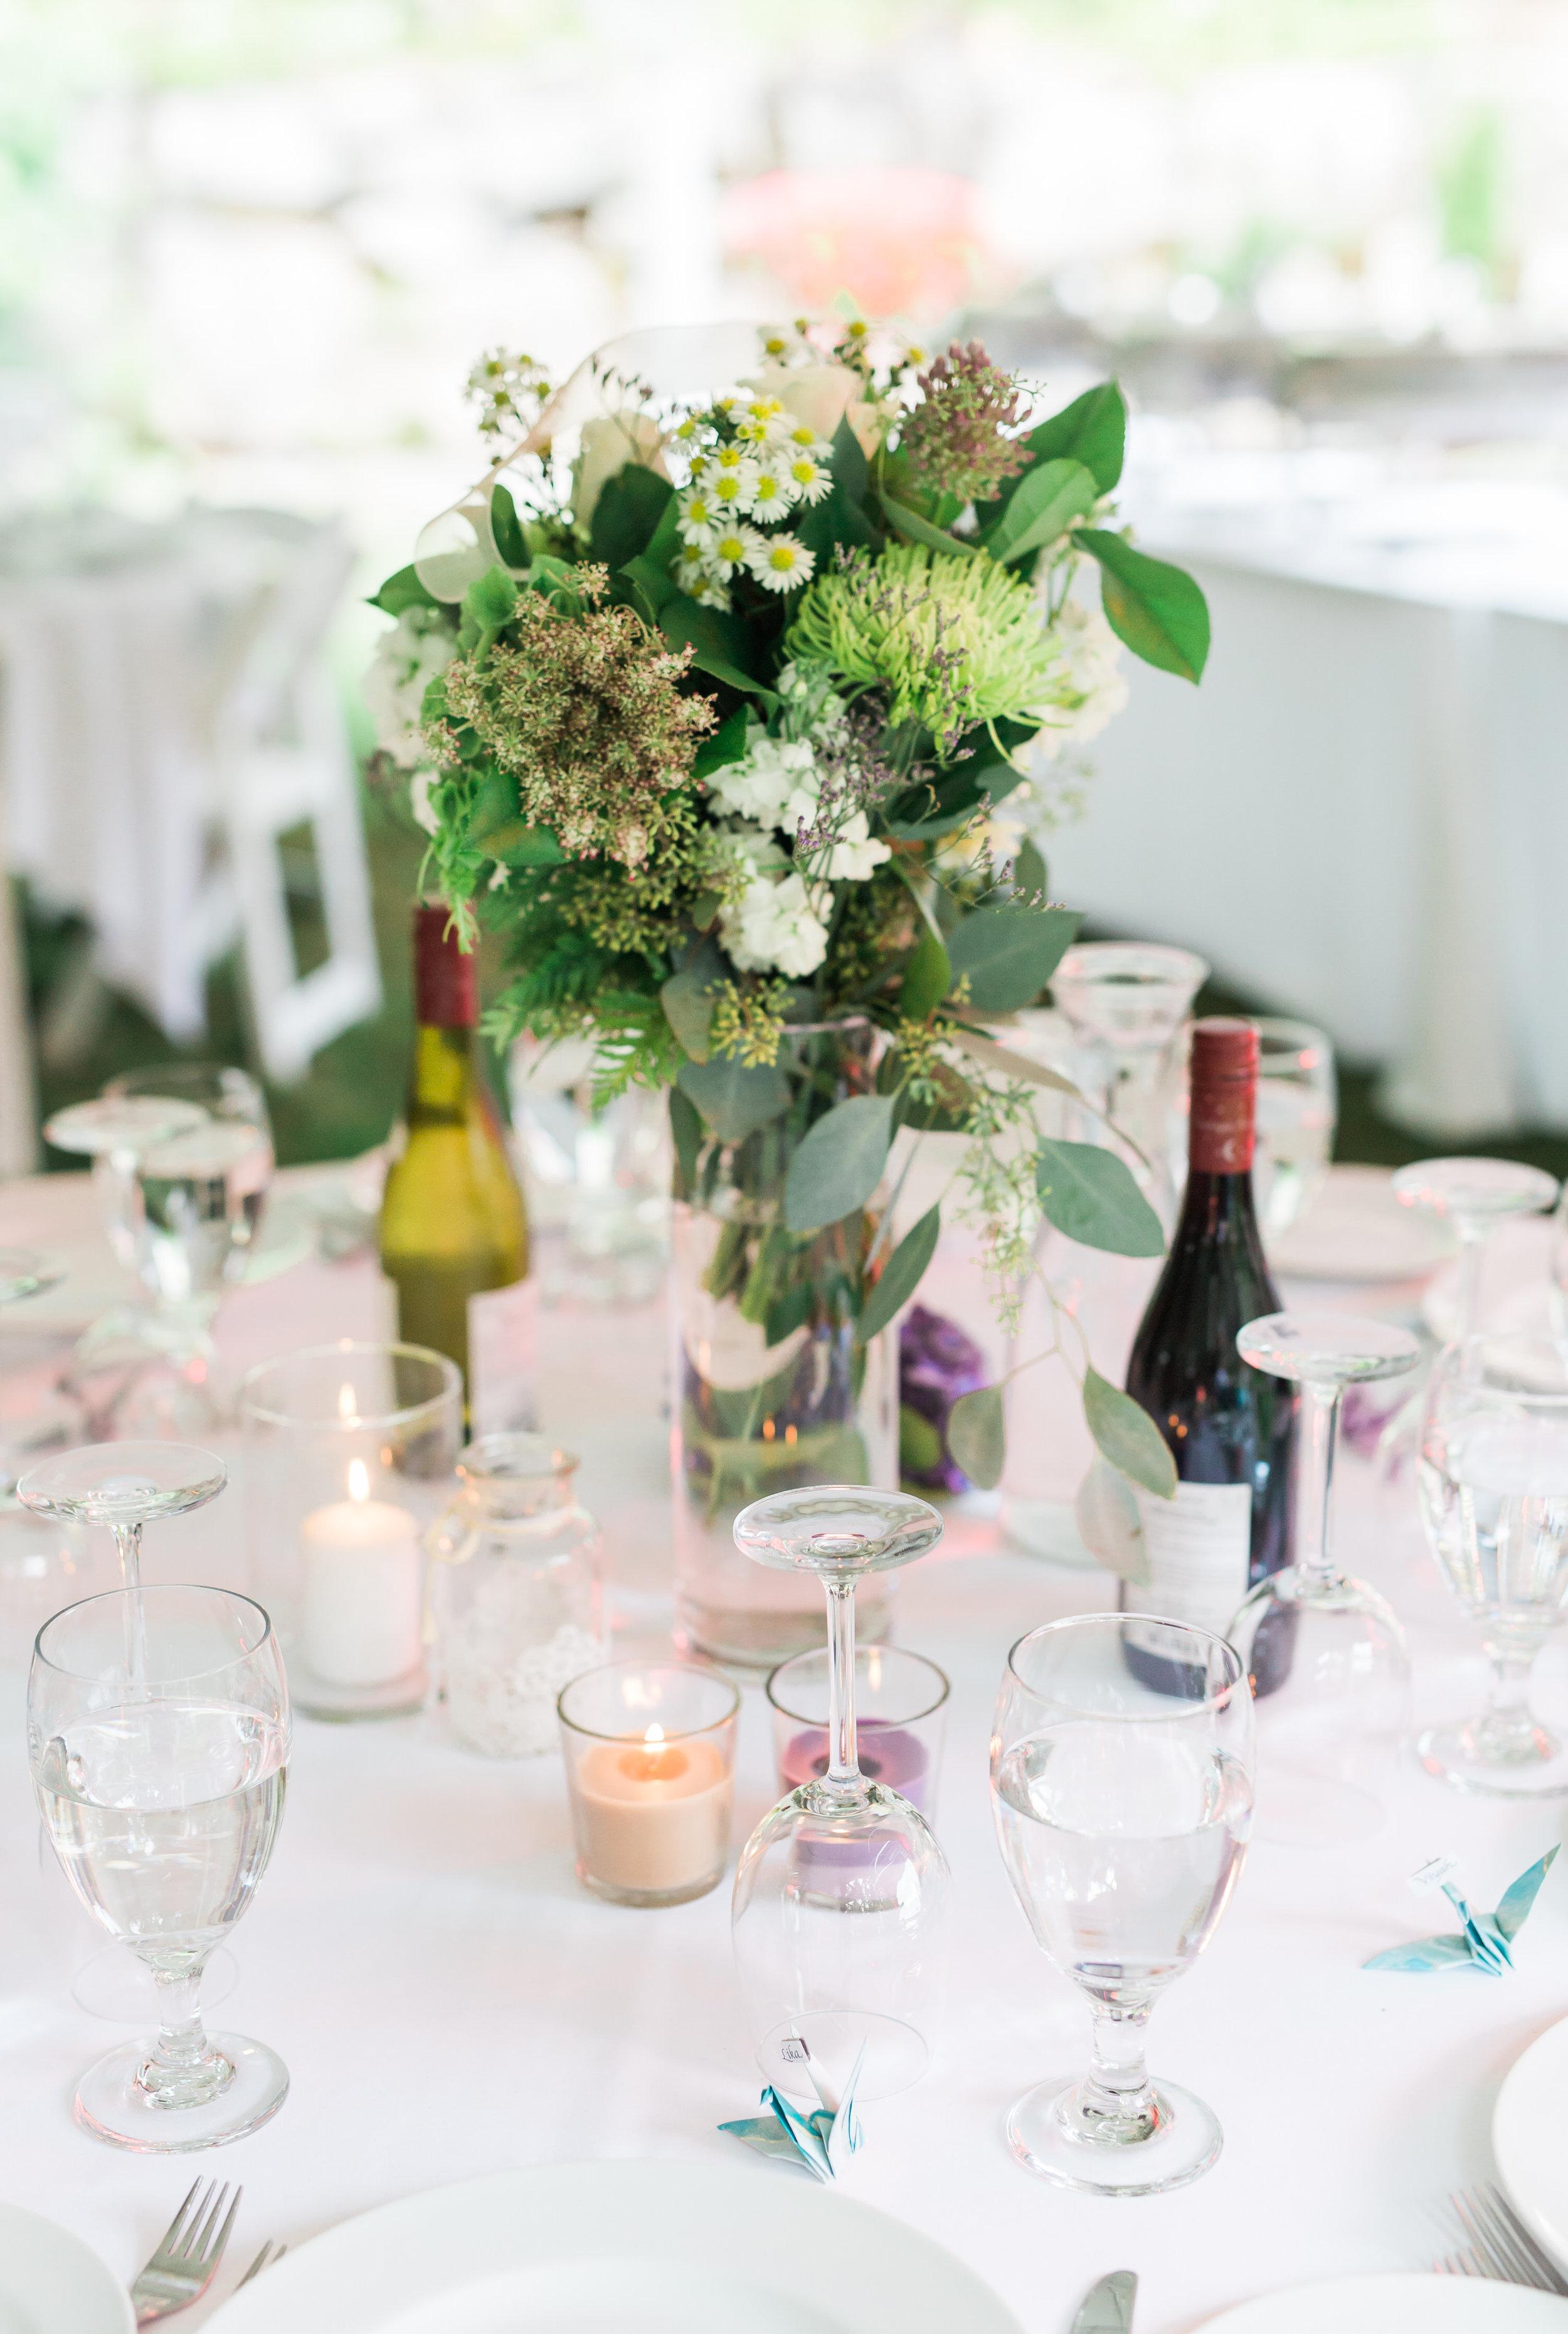 Linwood House Wedding Photos - Roberts Creek Wedding Photos - Vancouver Wedding Photographer & Videographer - Sunshine Coast Wedding Photos - Sunshine Coast Wedding Photographer - Jennifer Picard Photography